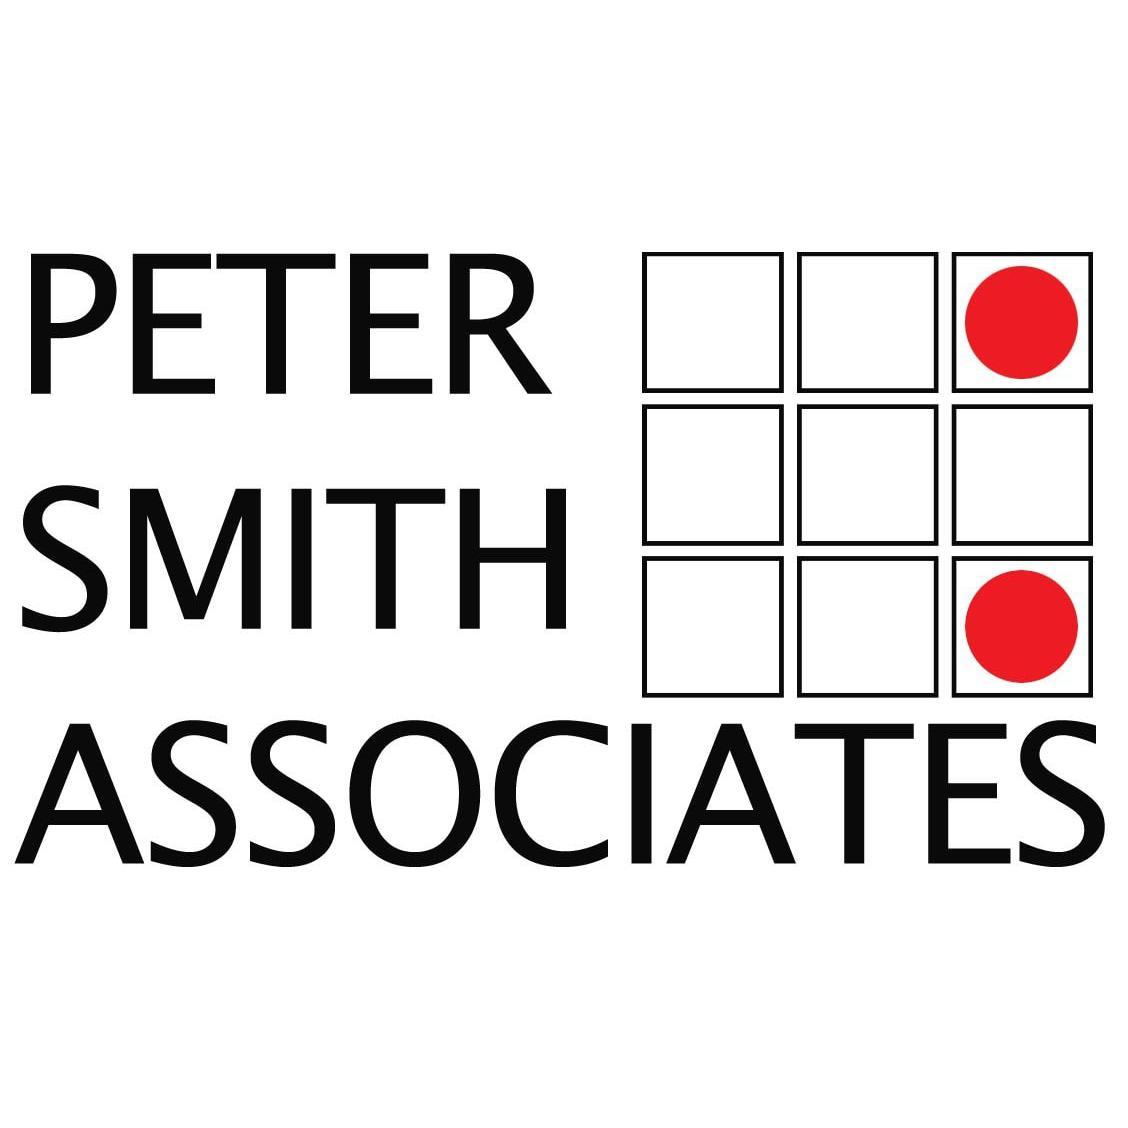 Peter Smith Associates